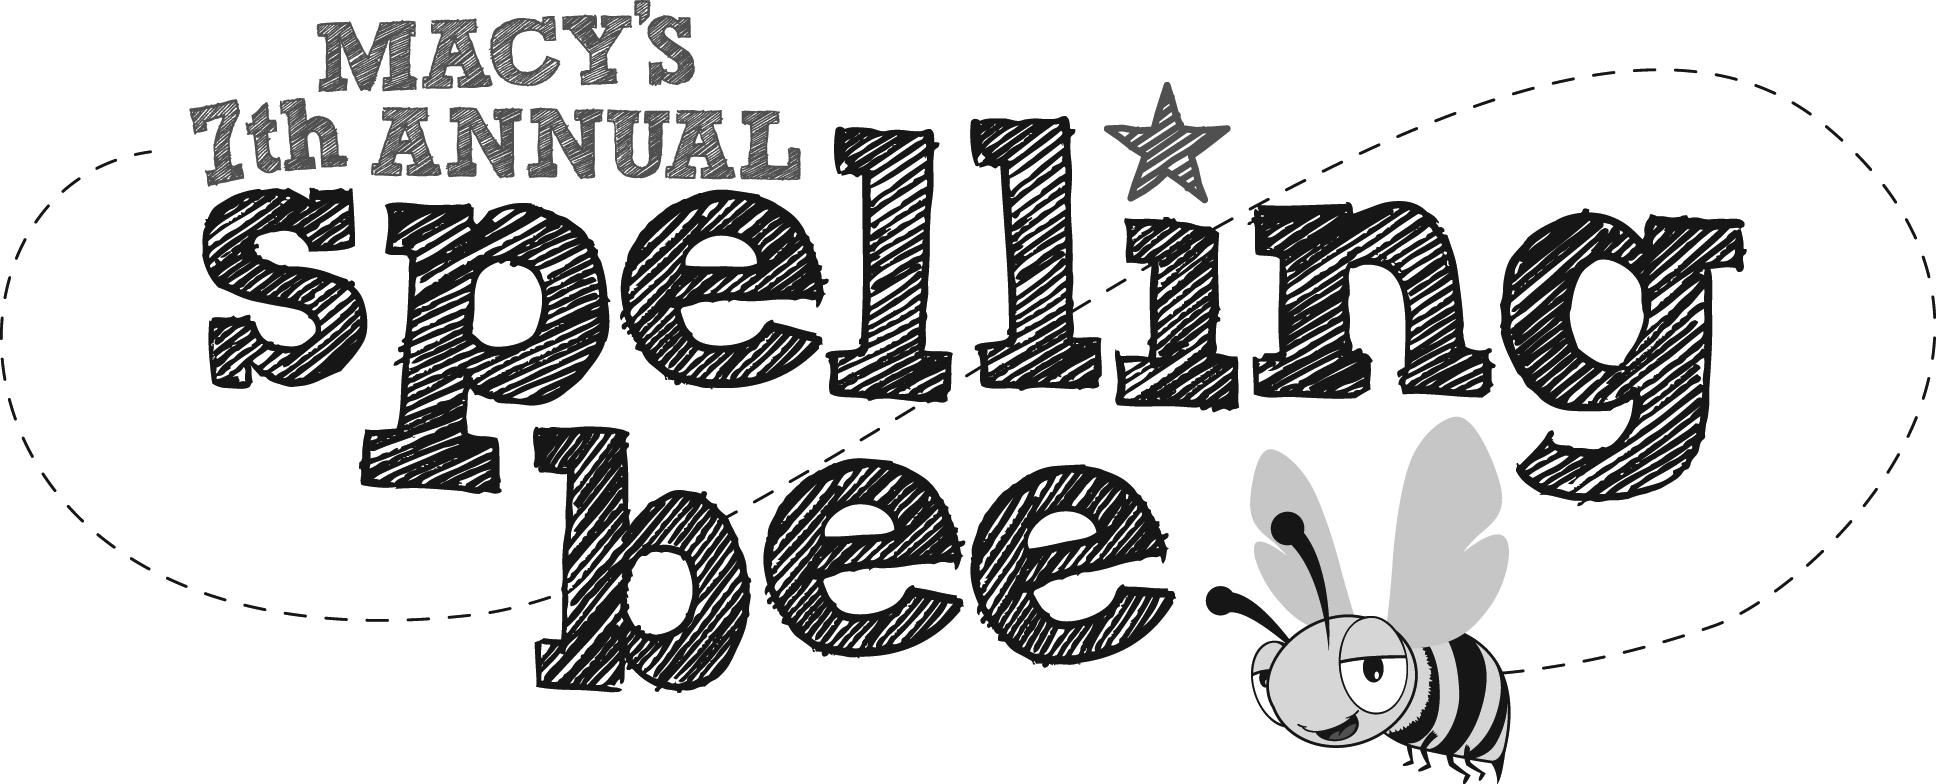 Macy's spelling bee